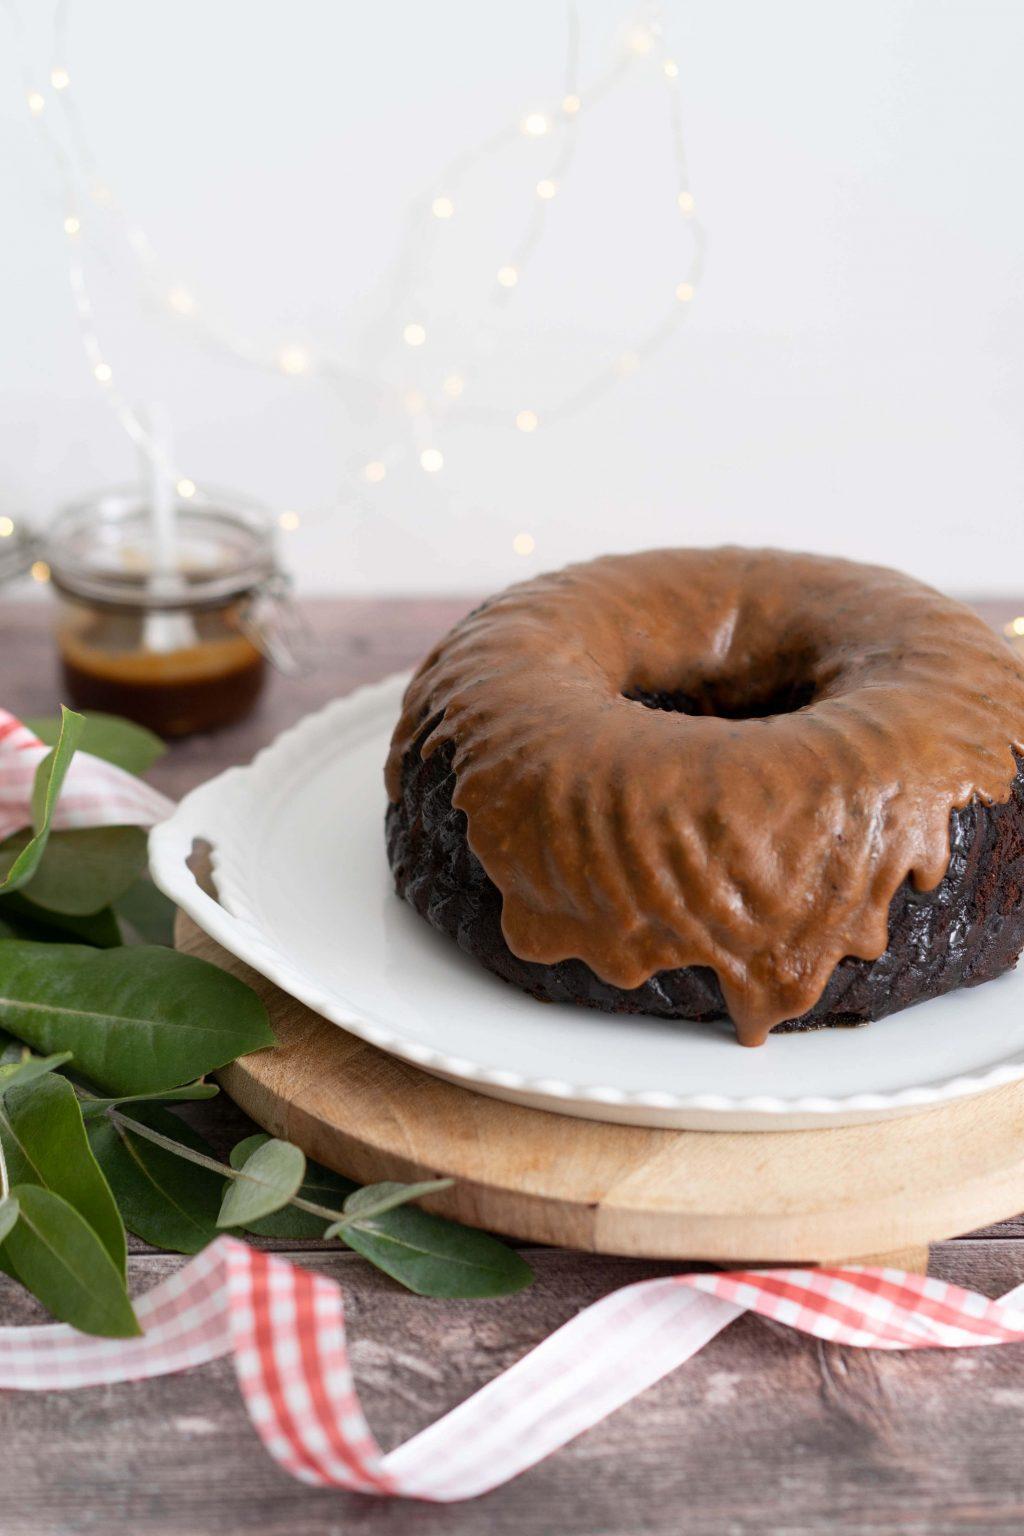 Chocolade-koffie tulband met topping van salted caramel